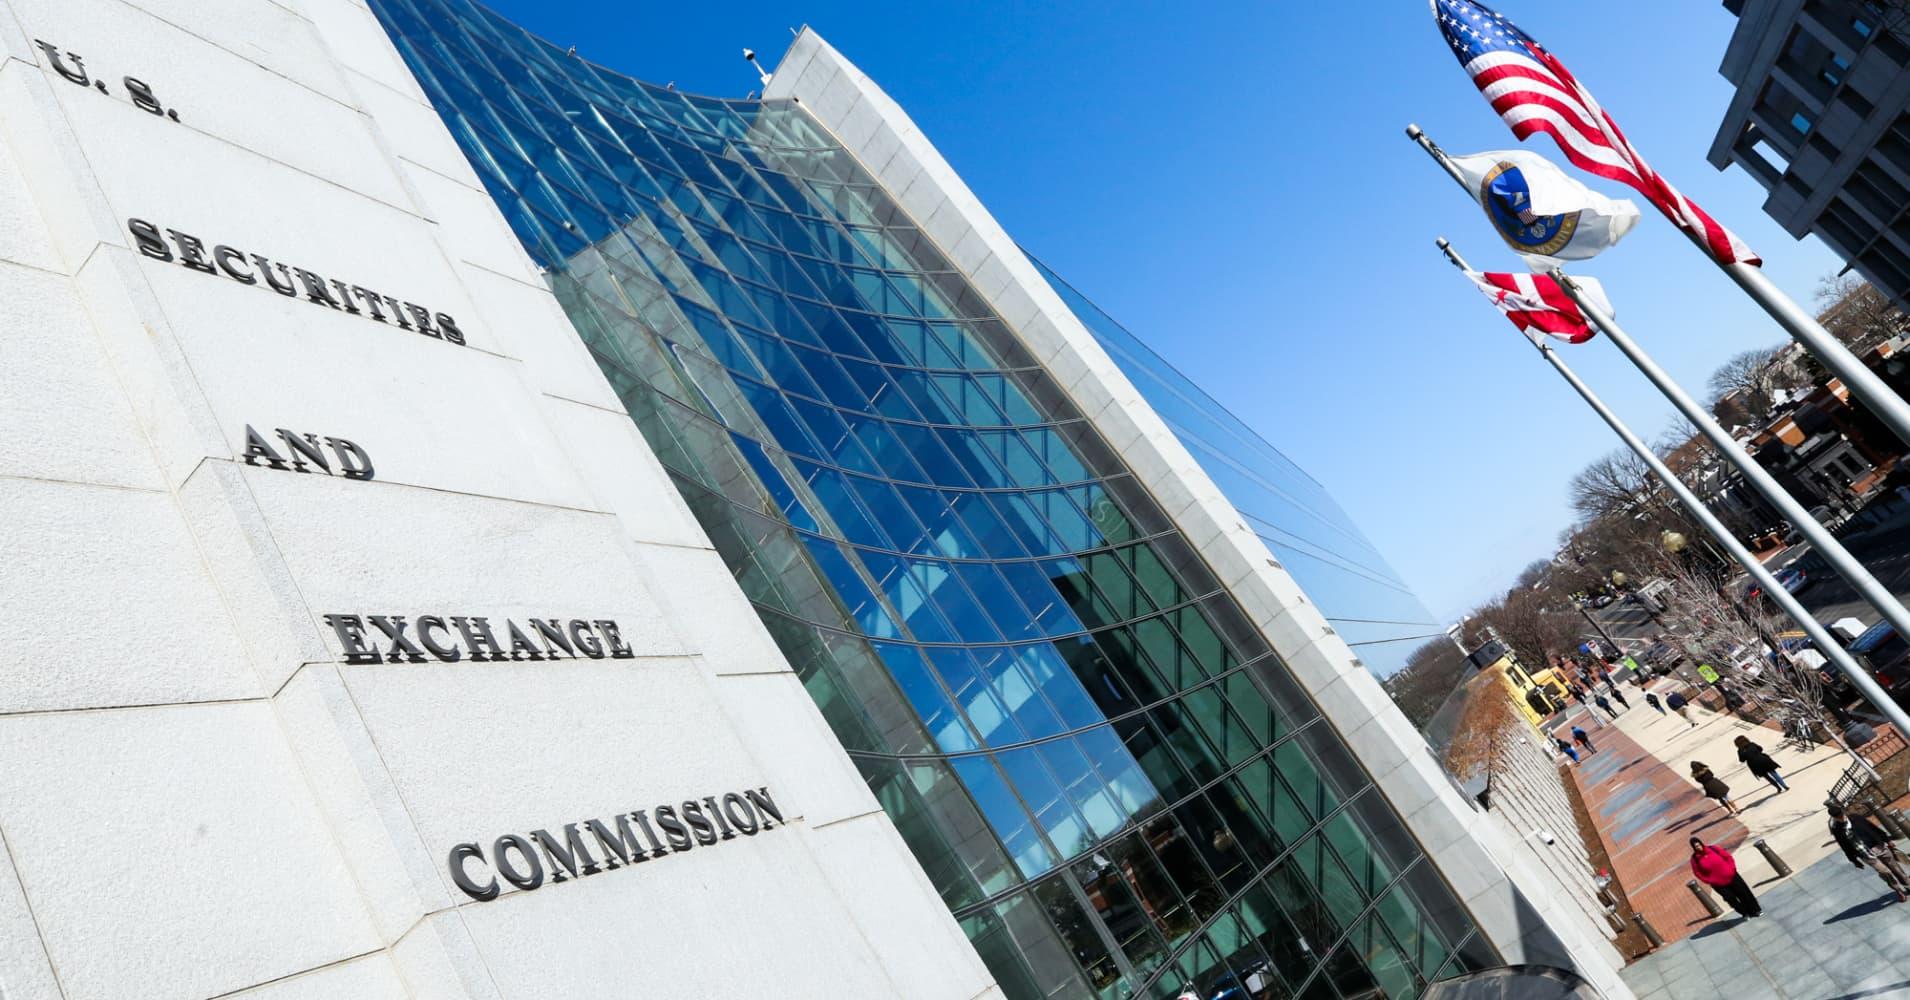 Woodbridge Group ordered to pay $1 billion for Ponzi scheme targeting retail investors